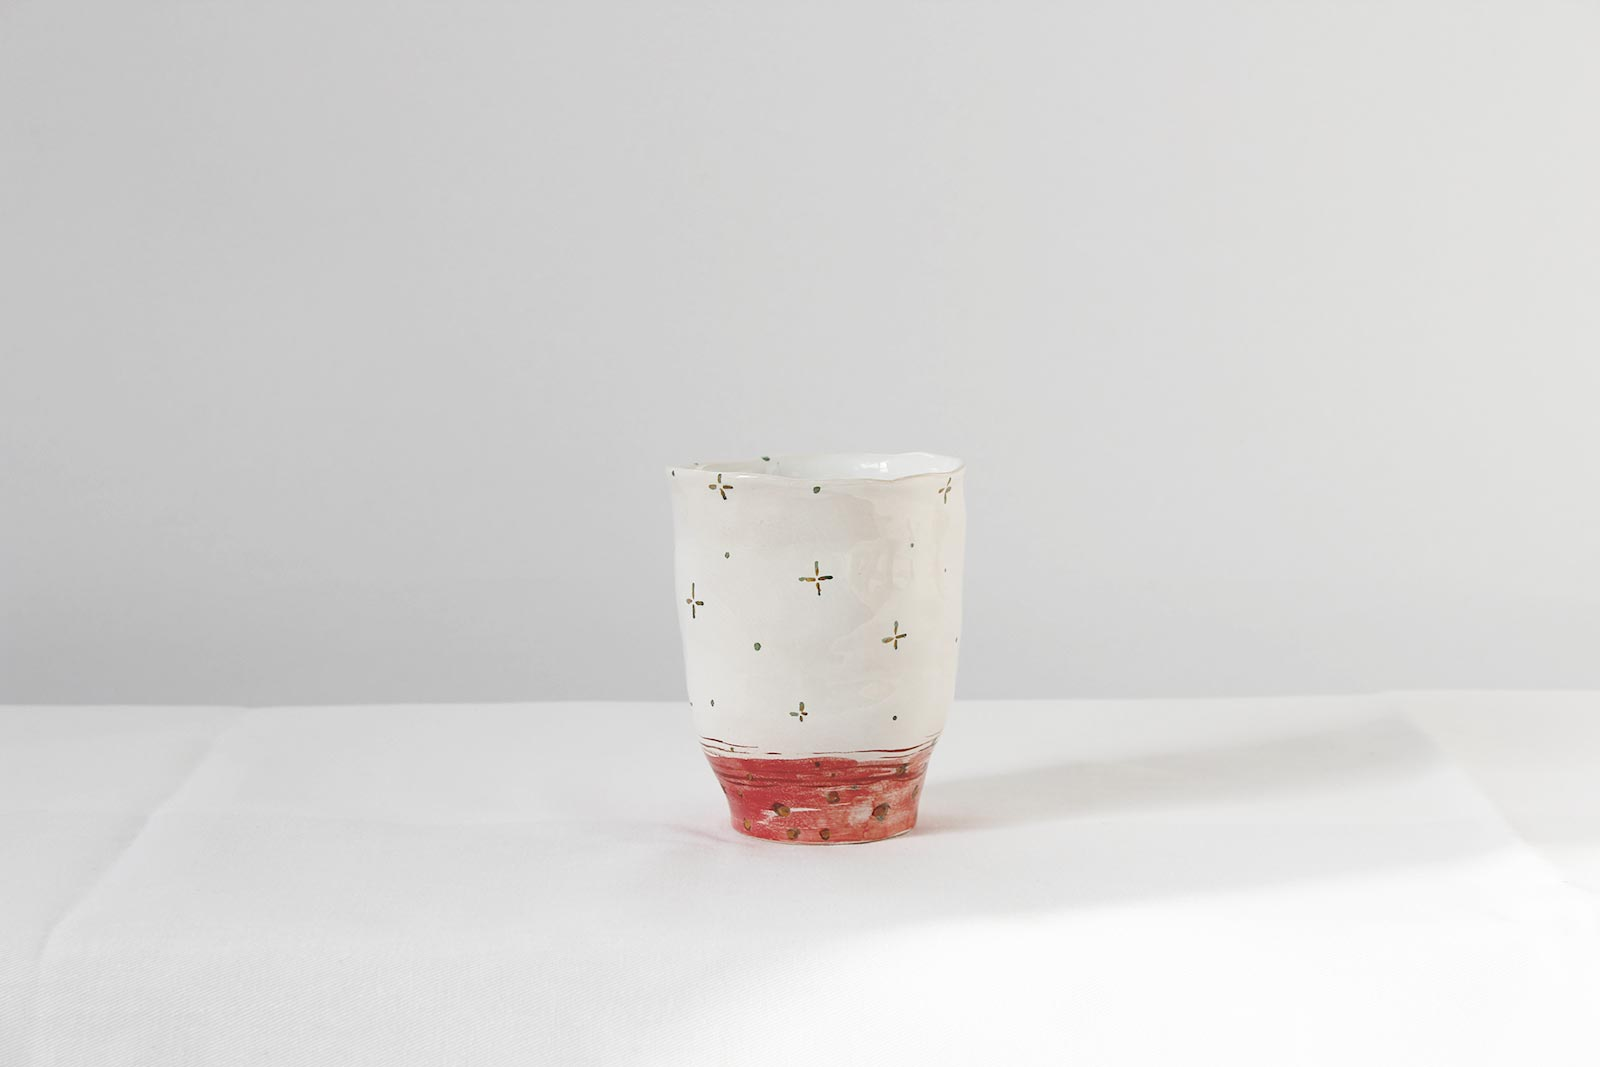 Rear view - Glass from ceramics (Handmade)